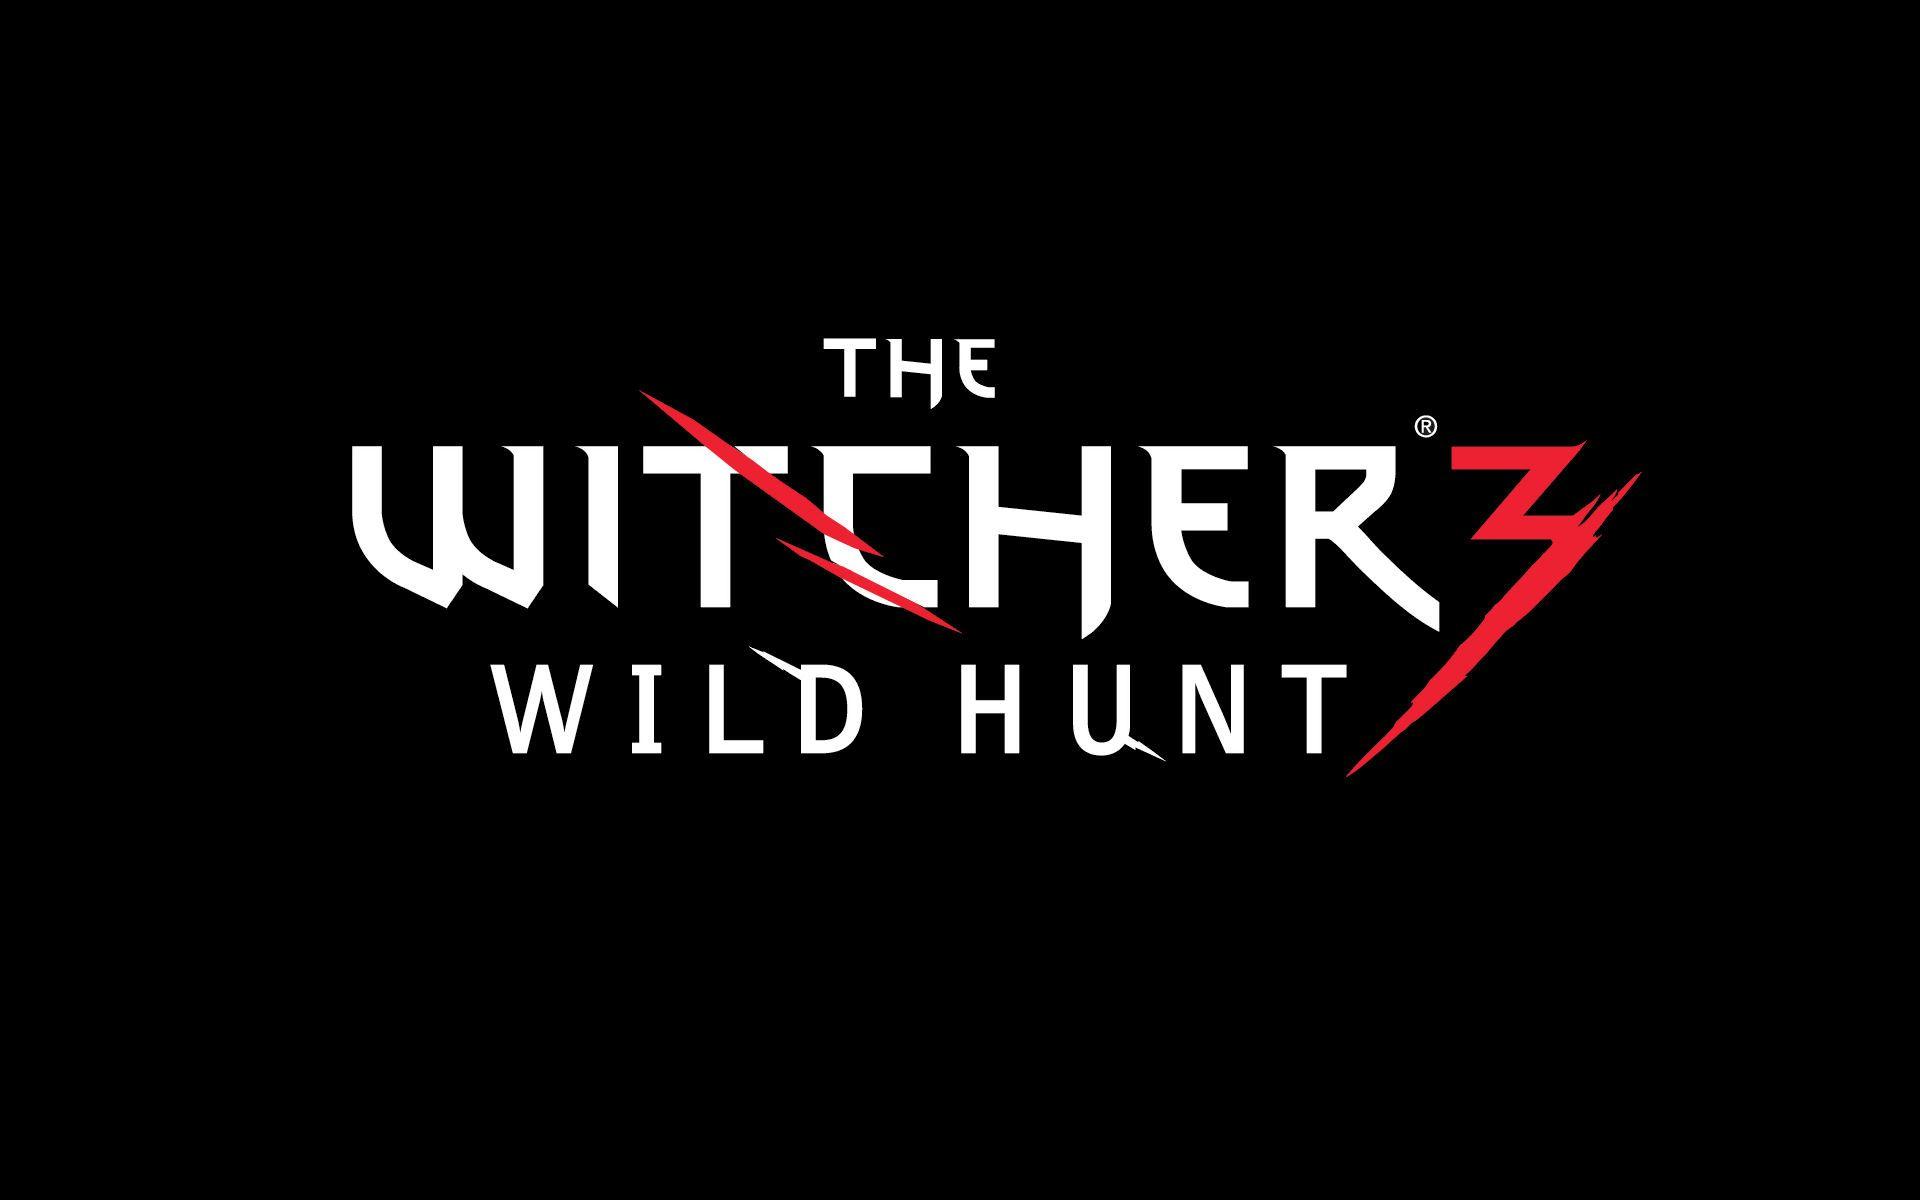 6986287 the witcher 3 logo análise, jogo, jogos, Playstation 4, The Witcher 3